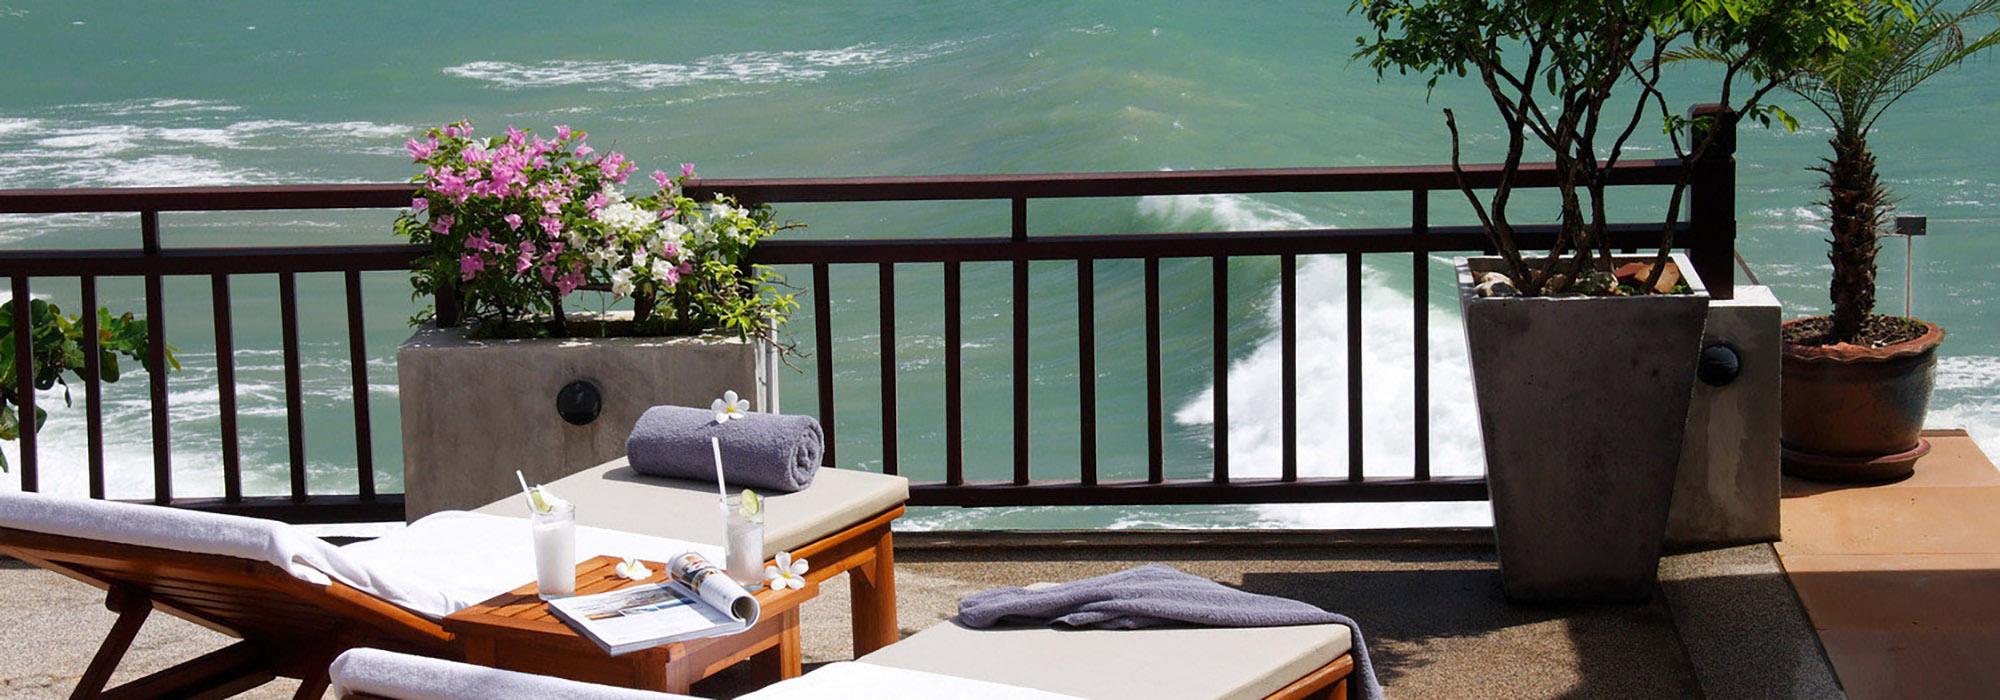 Pool Villa for Rent in Phuket. Ocean Front